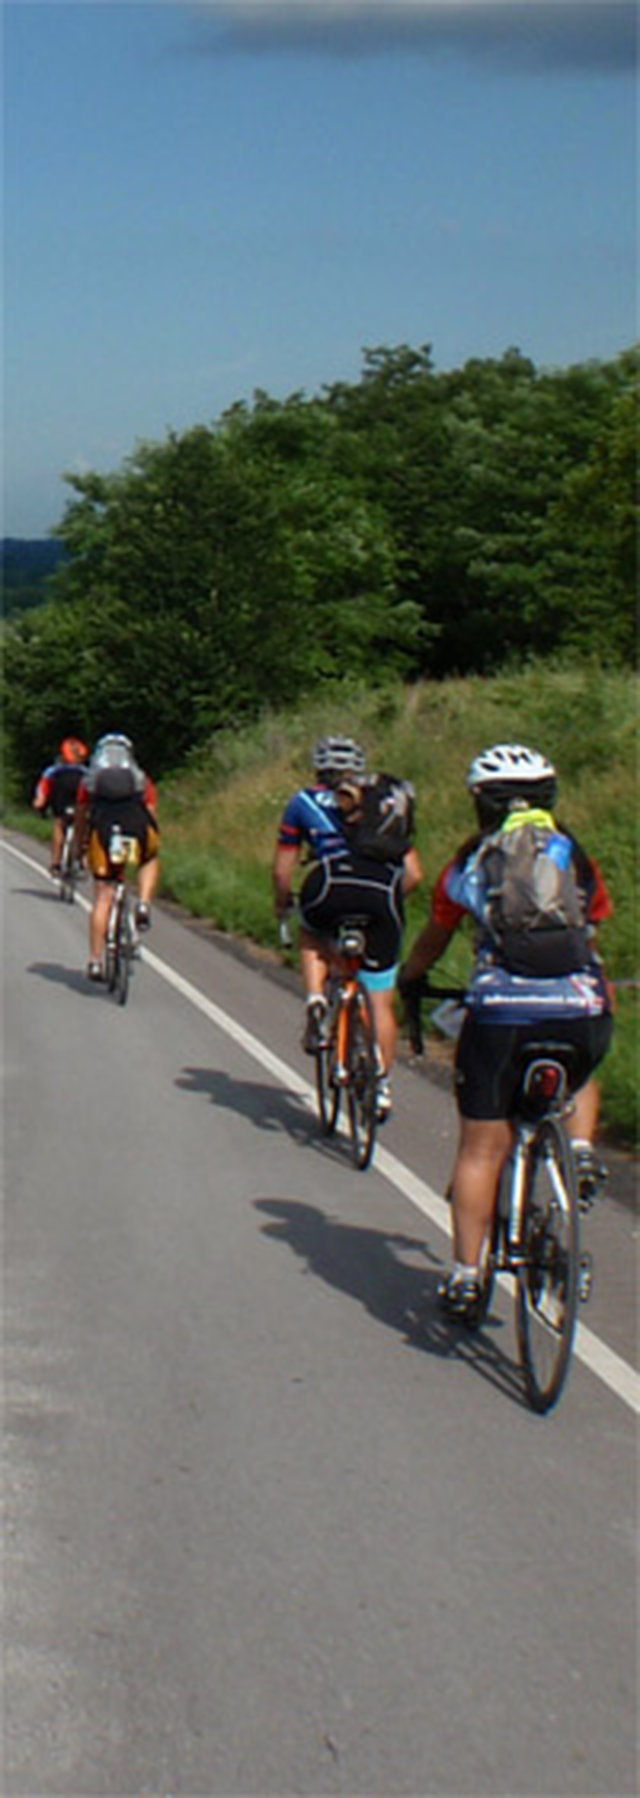 Capital Ride 2013